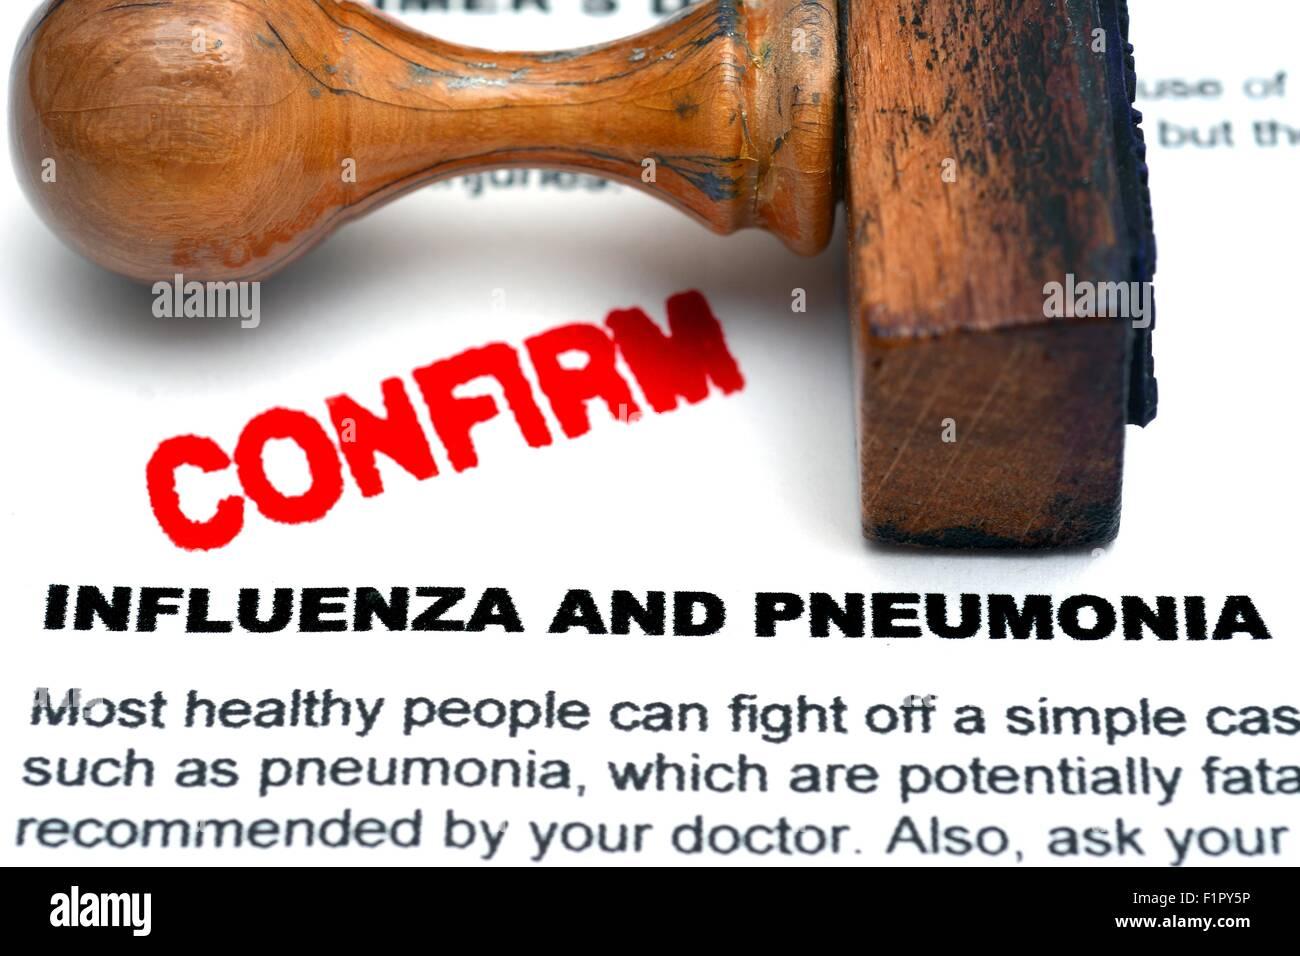 Influenza and pneumonia - Stock Image